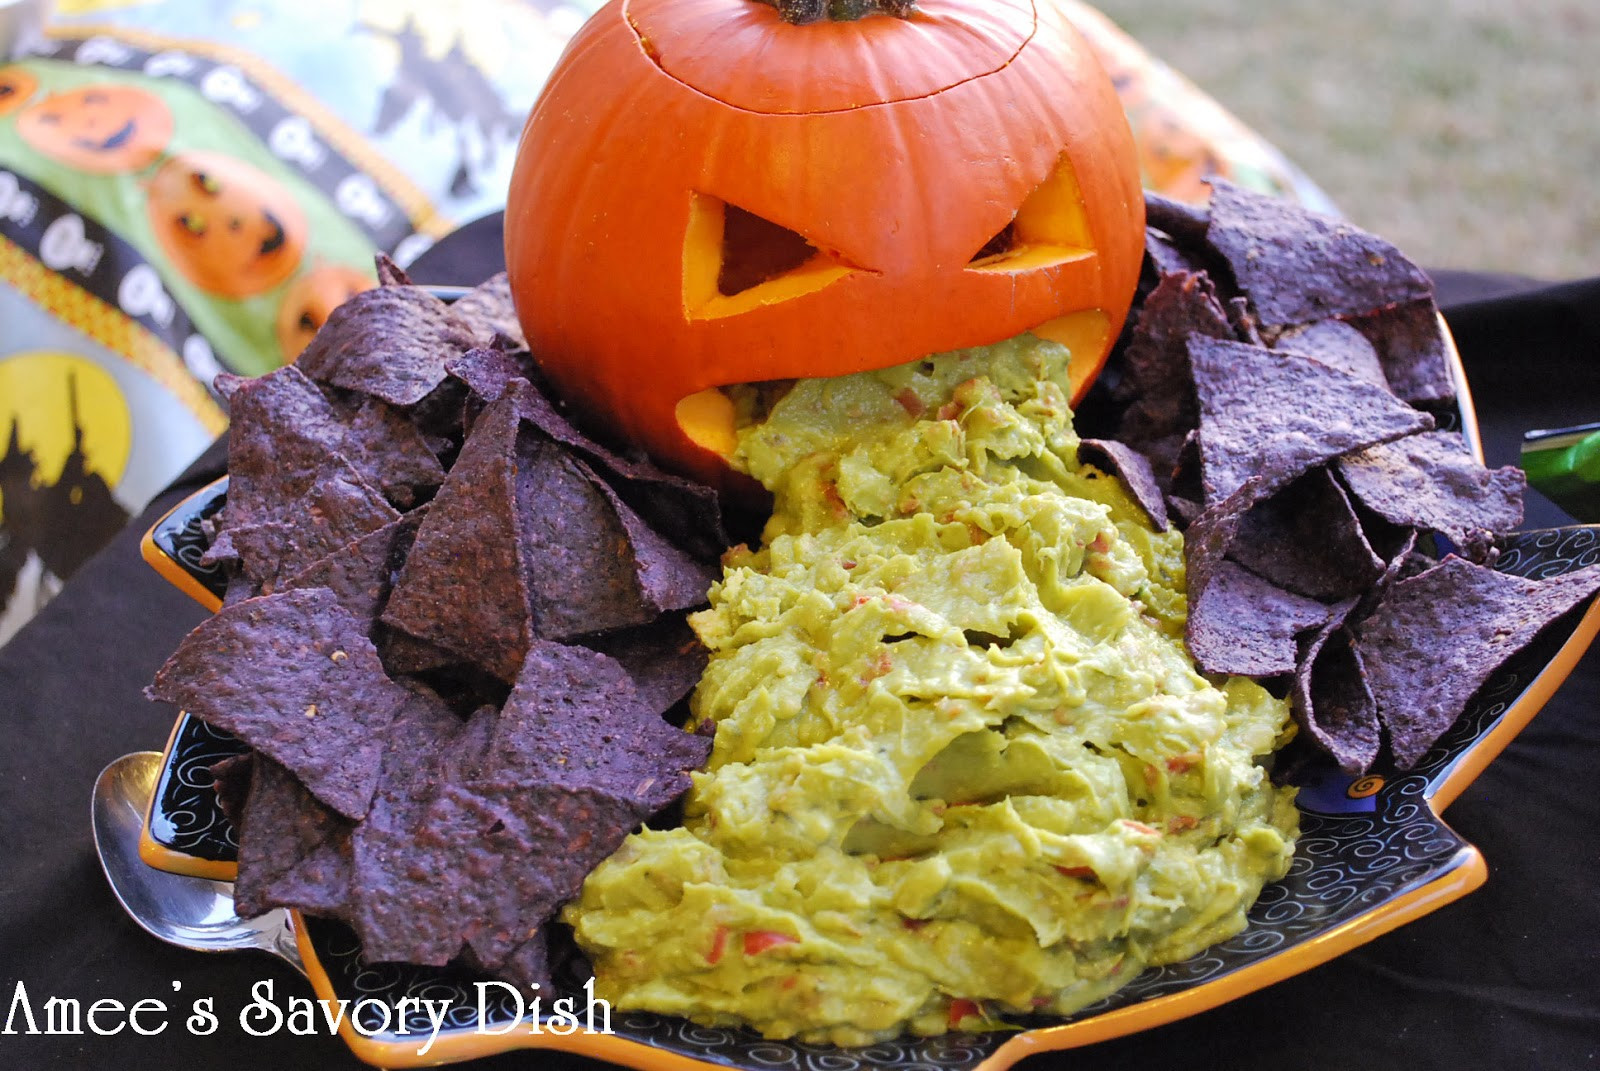 Halloween Party Menu Ideas For Adults  Food halloween food ideas